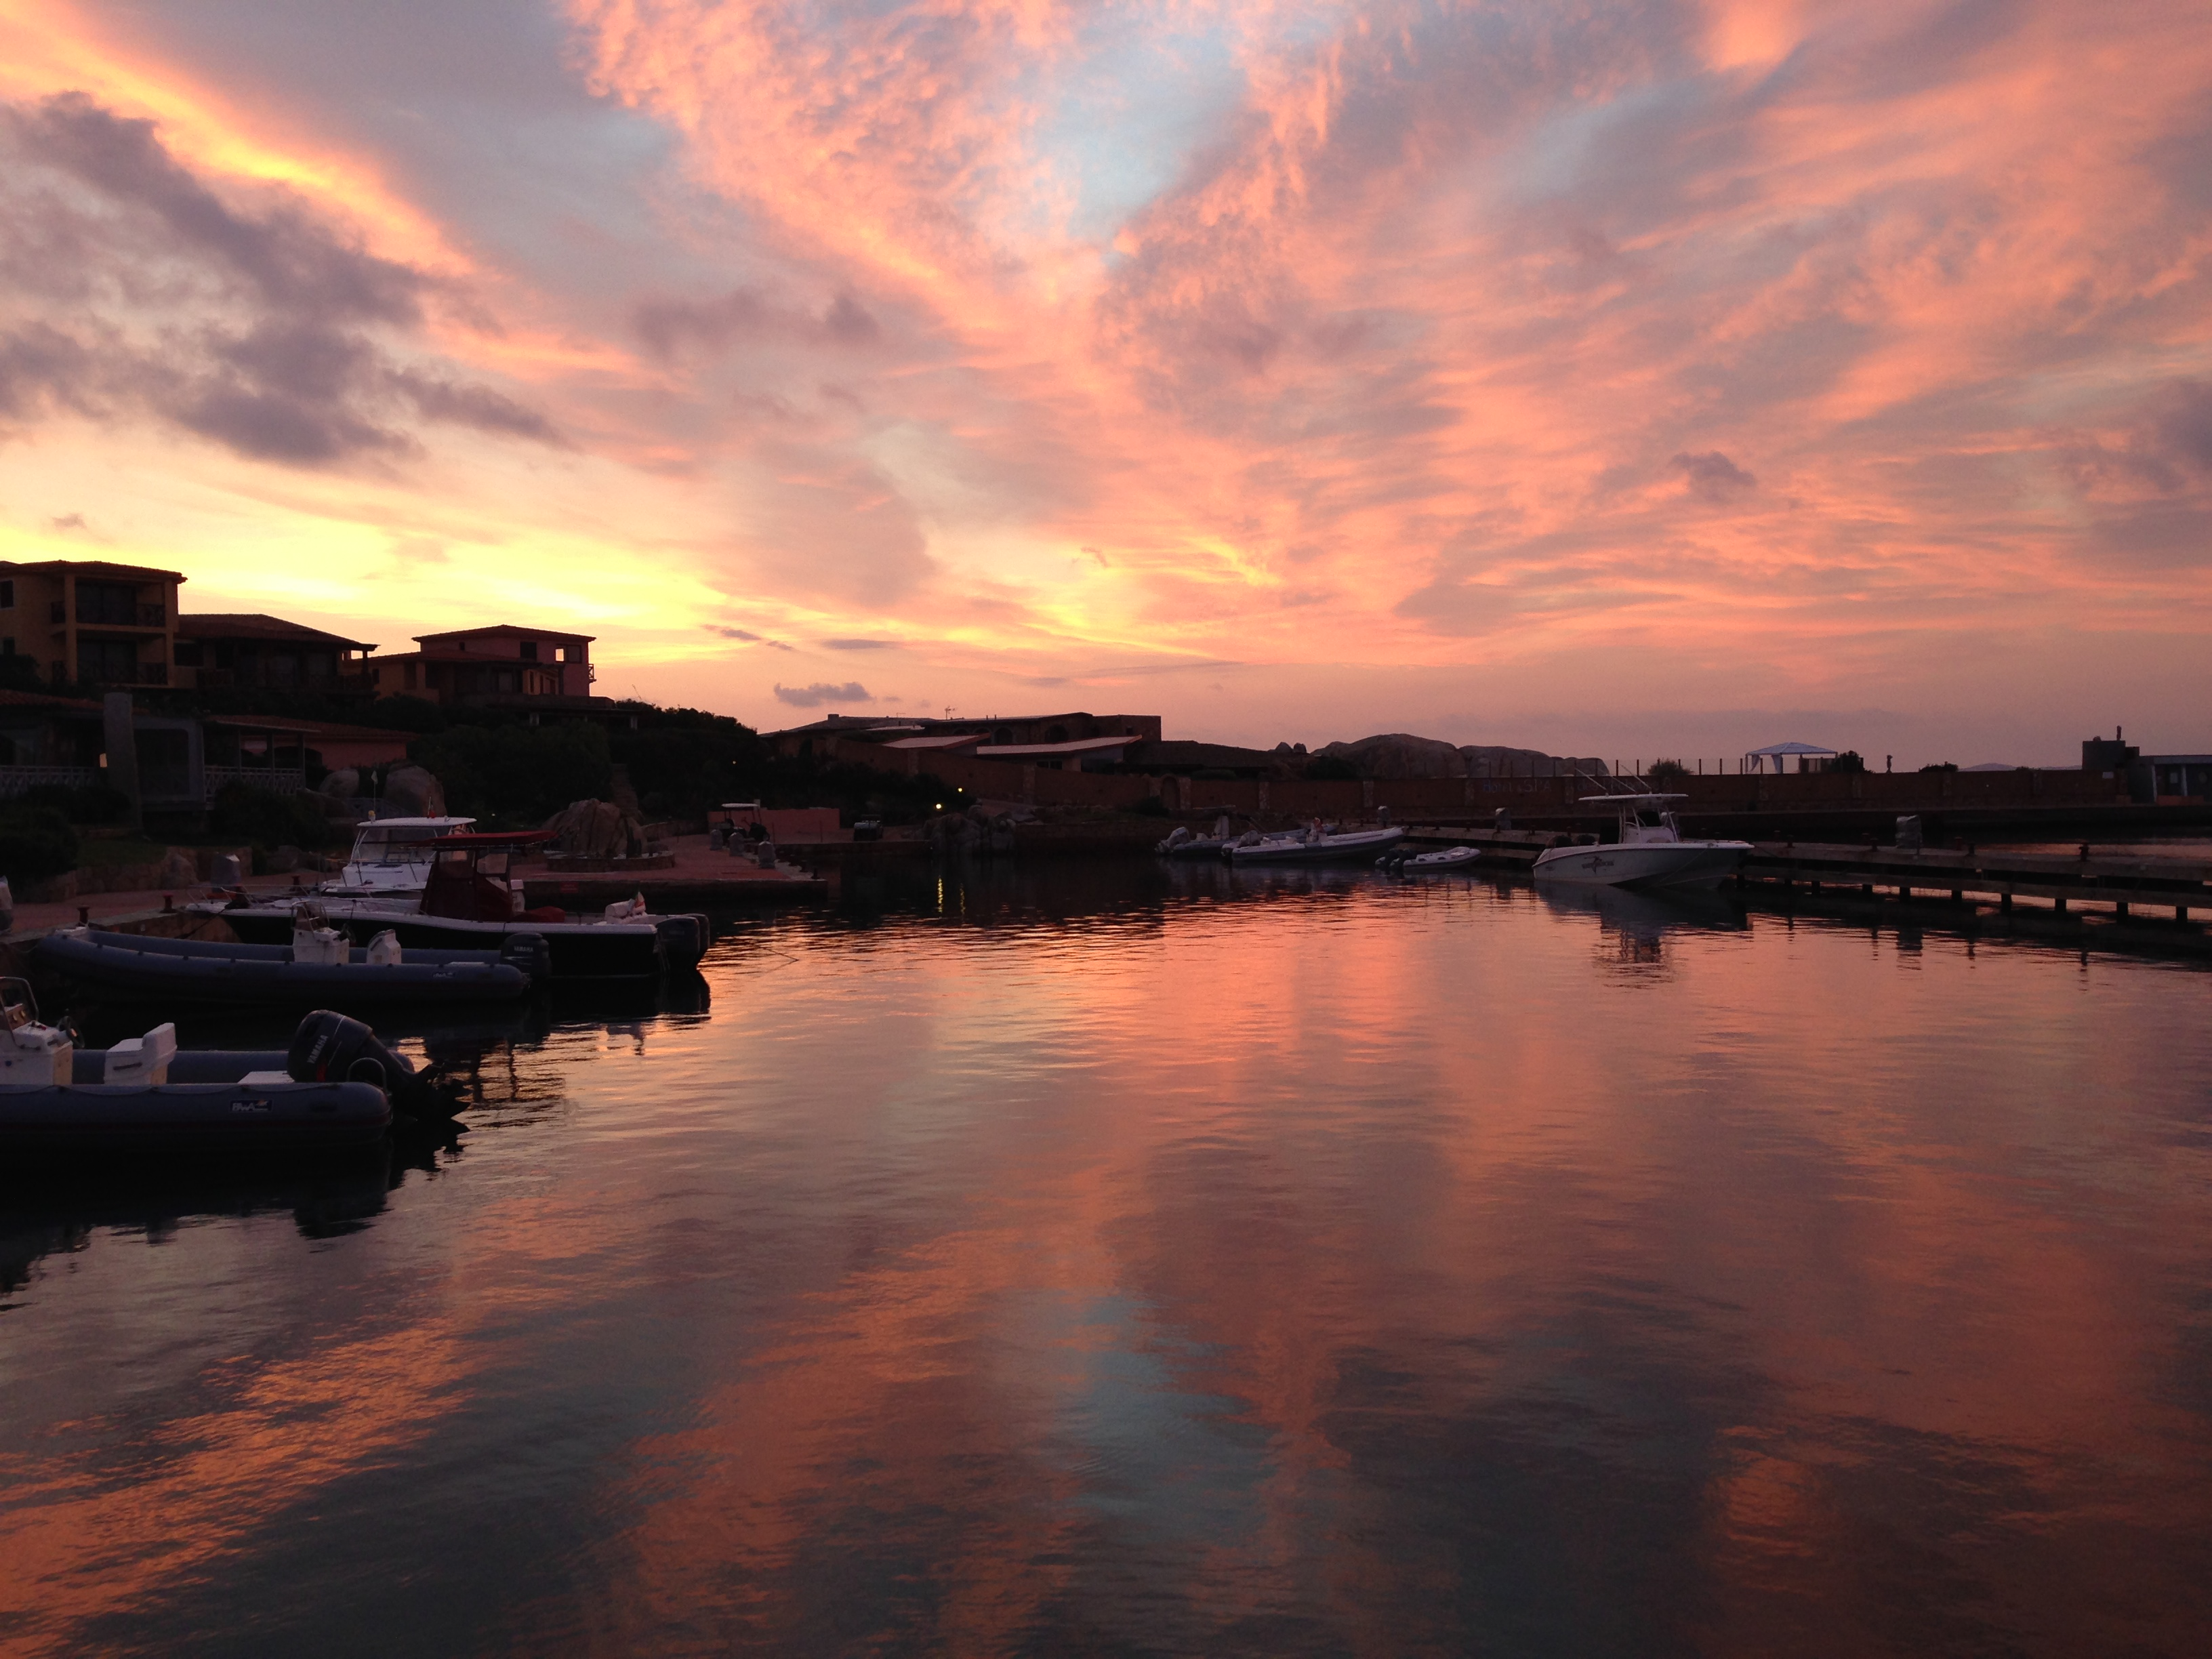 Sunrise at the Harbour of Cavallo Island